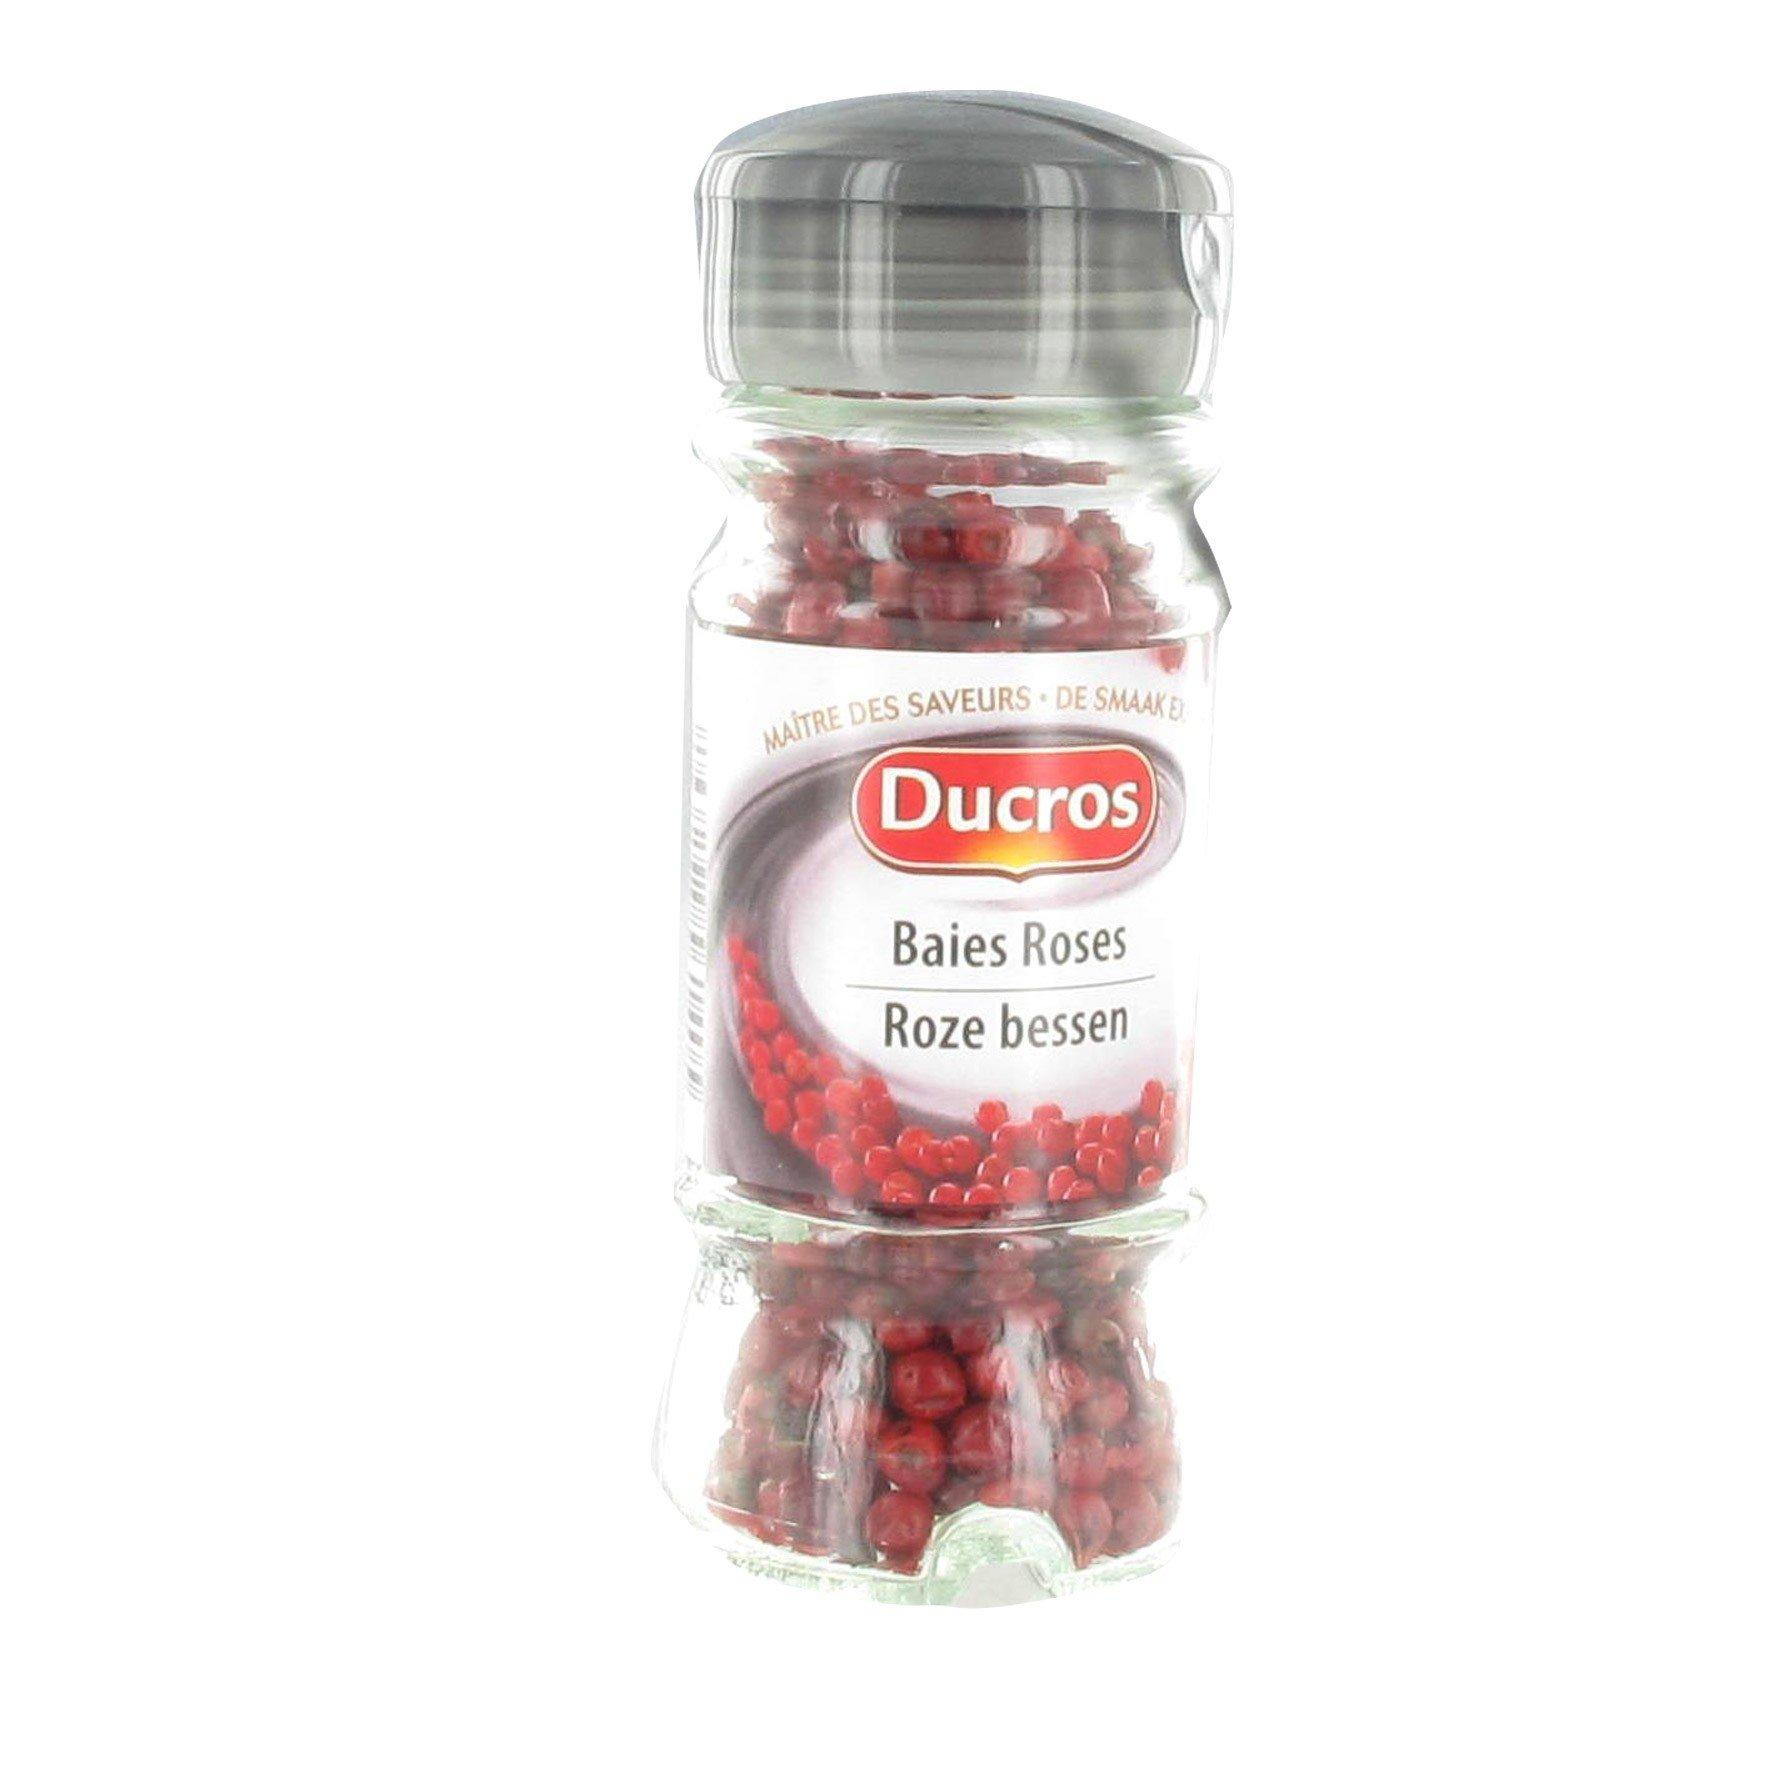 Ducros Pink Pepper 7.7 oz Ducros Pink Peppercorns 220 grams Foodservice Restaurants